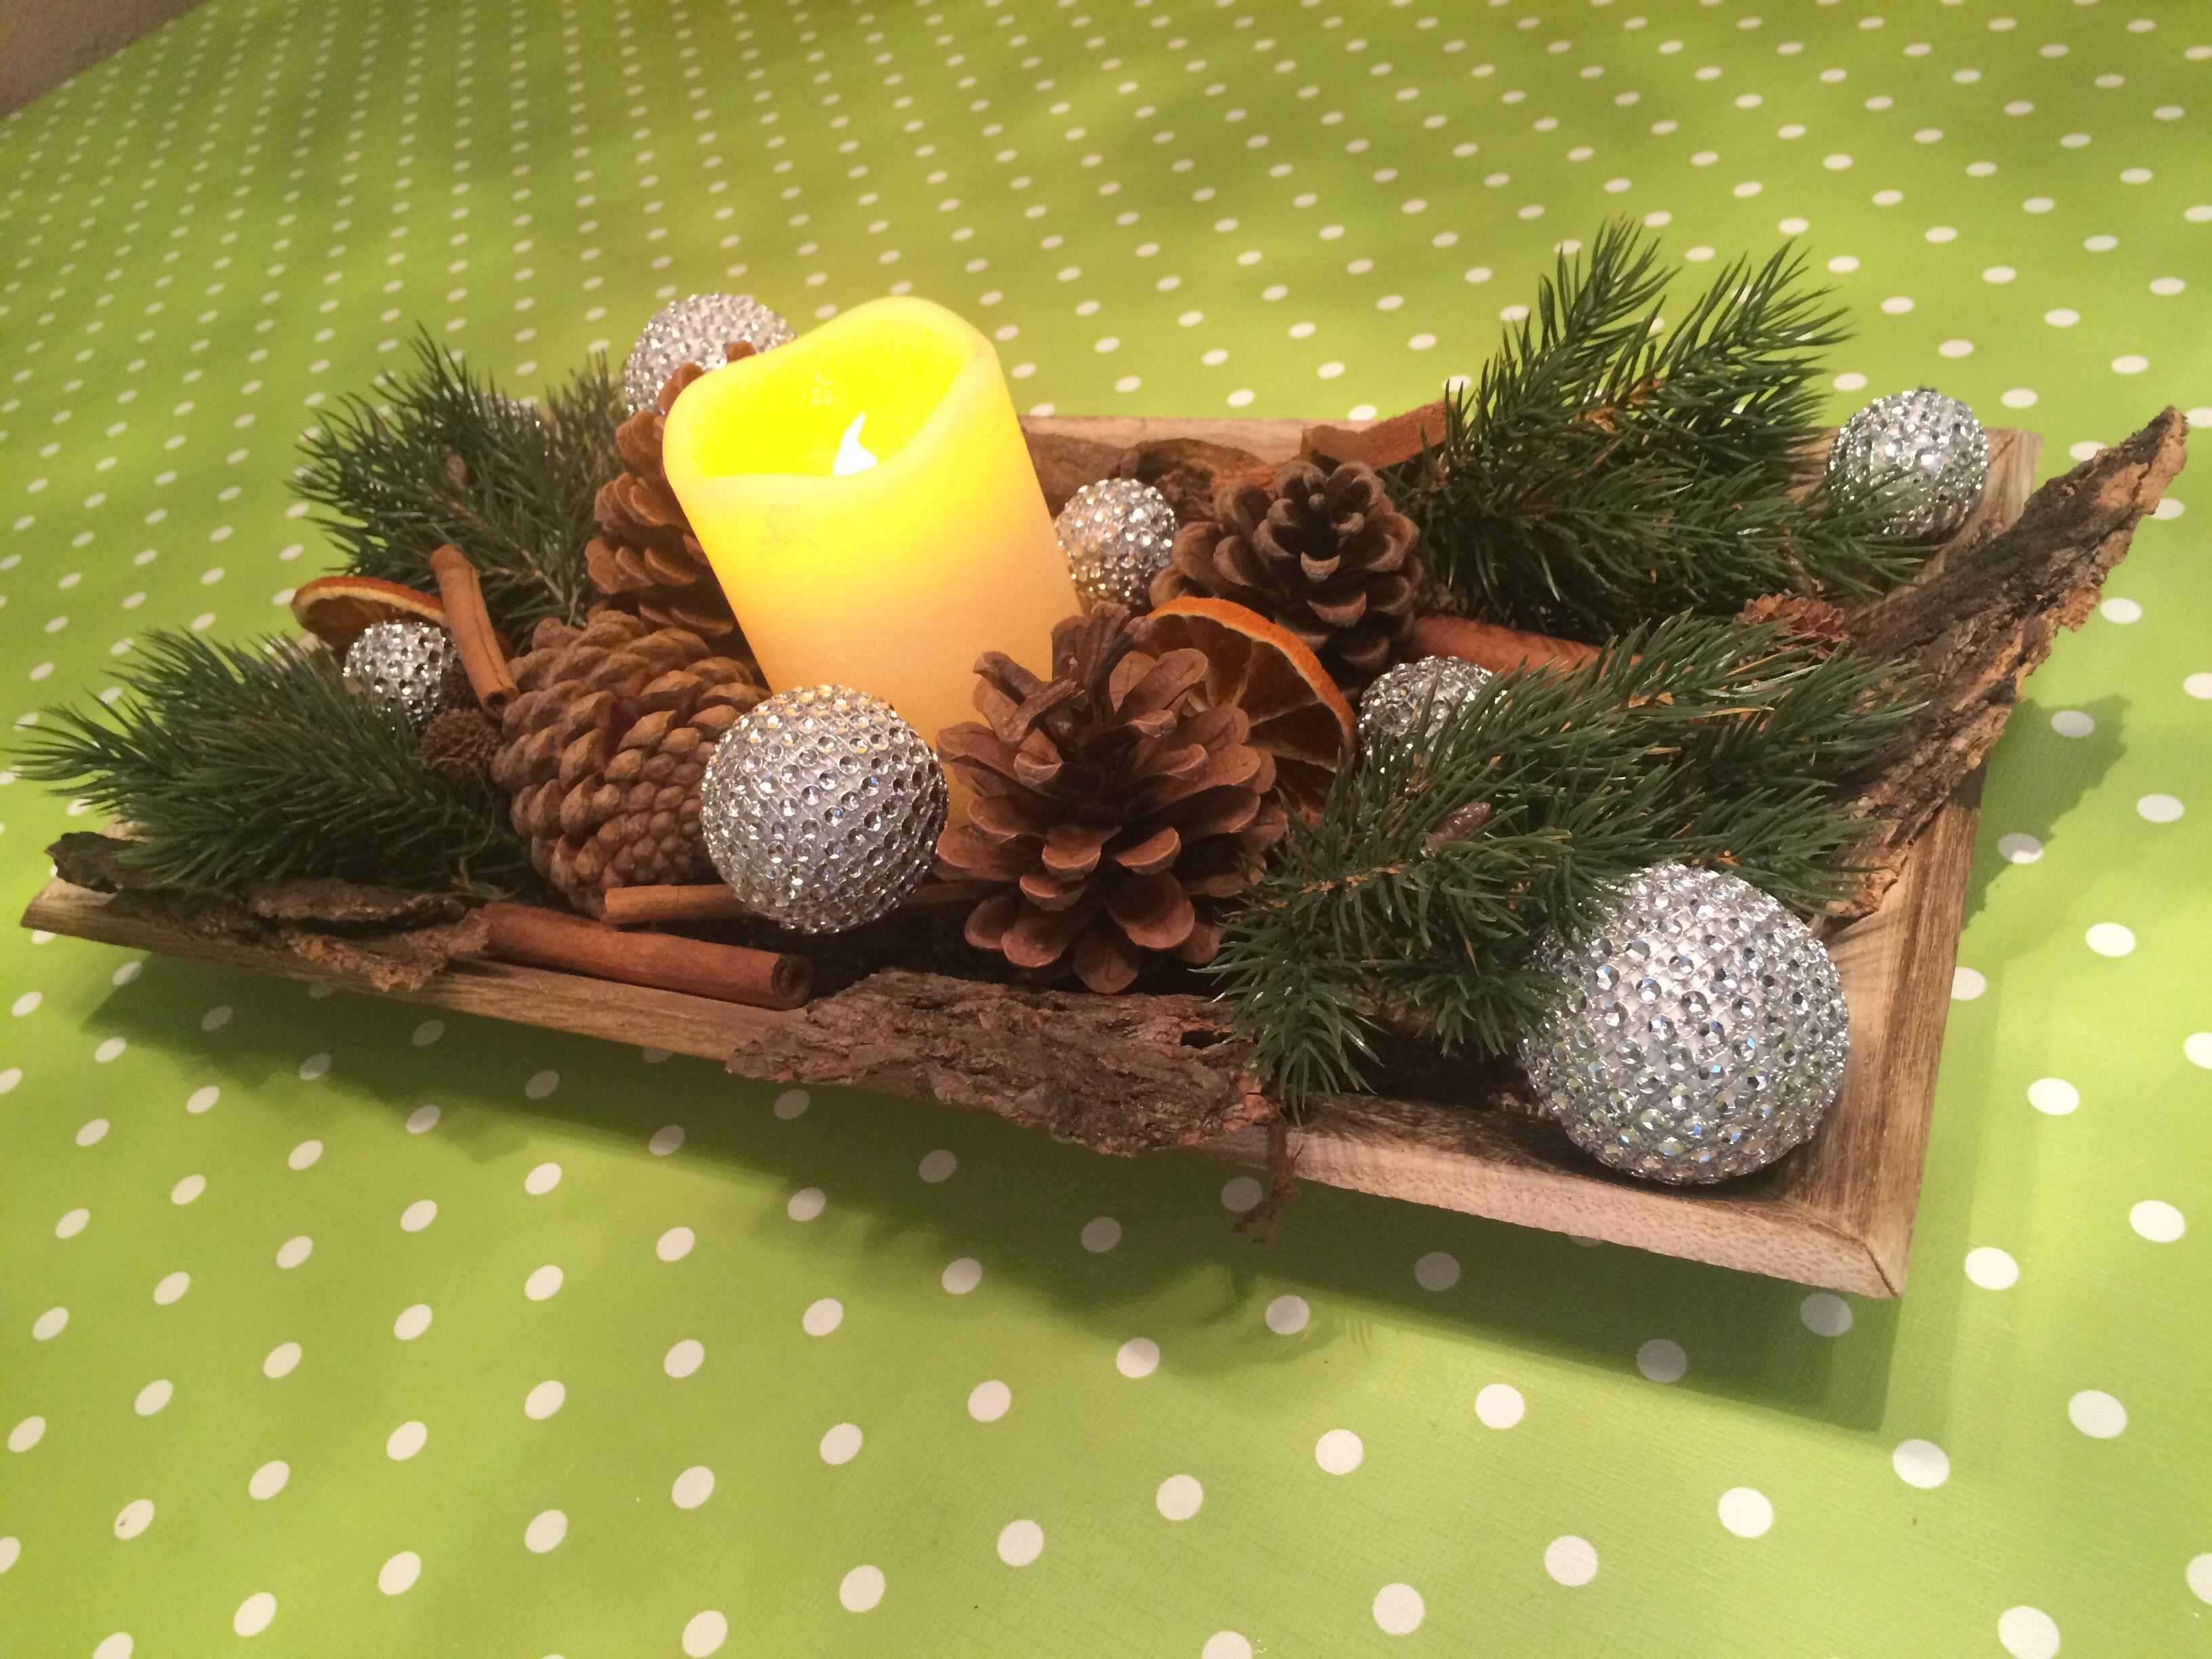 Diy weihnachts deko zubeh r von nanu nana xmas deko for Nanu nana weihnachten